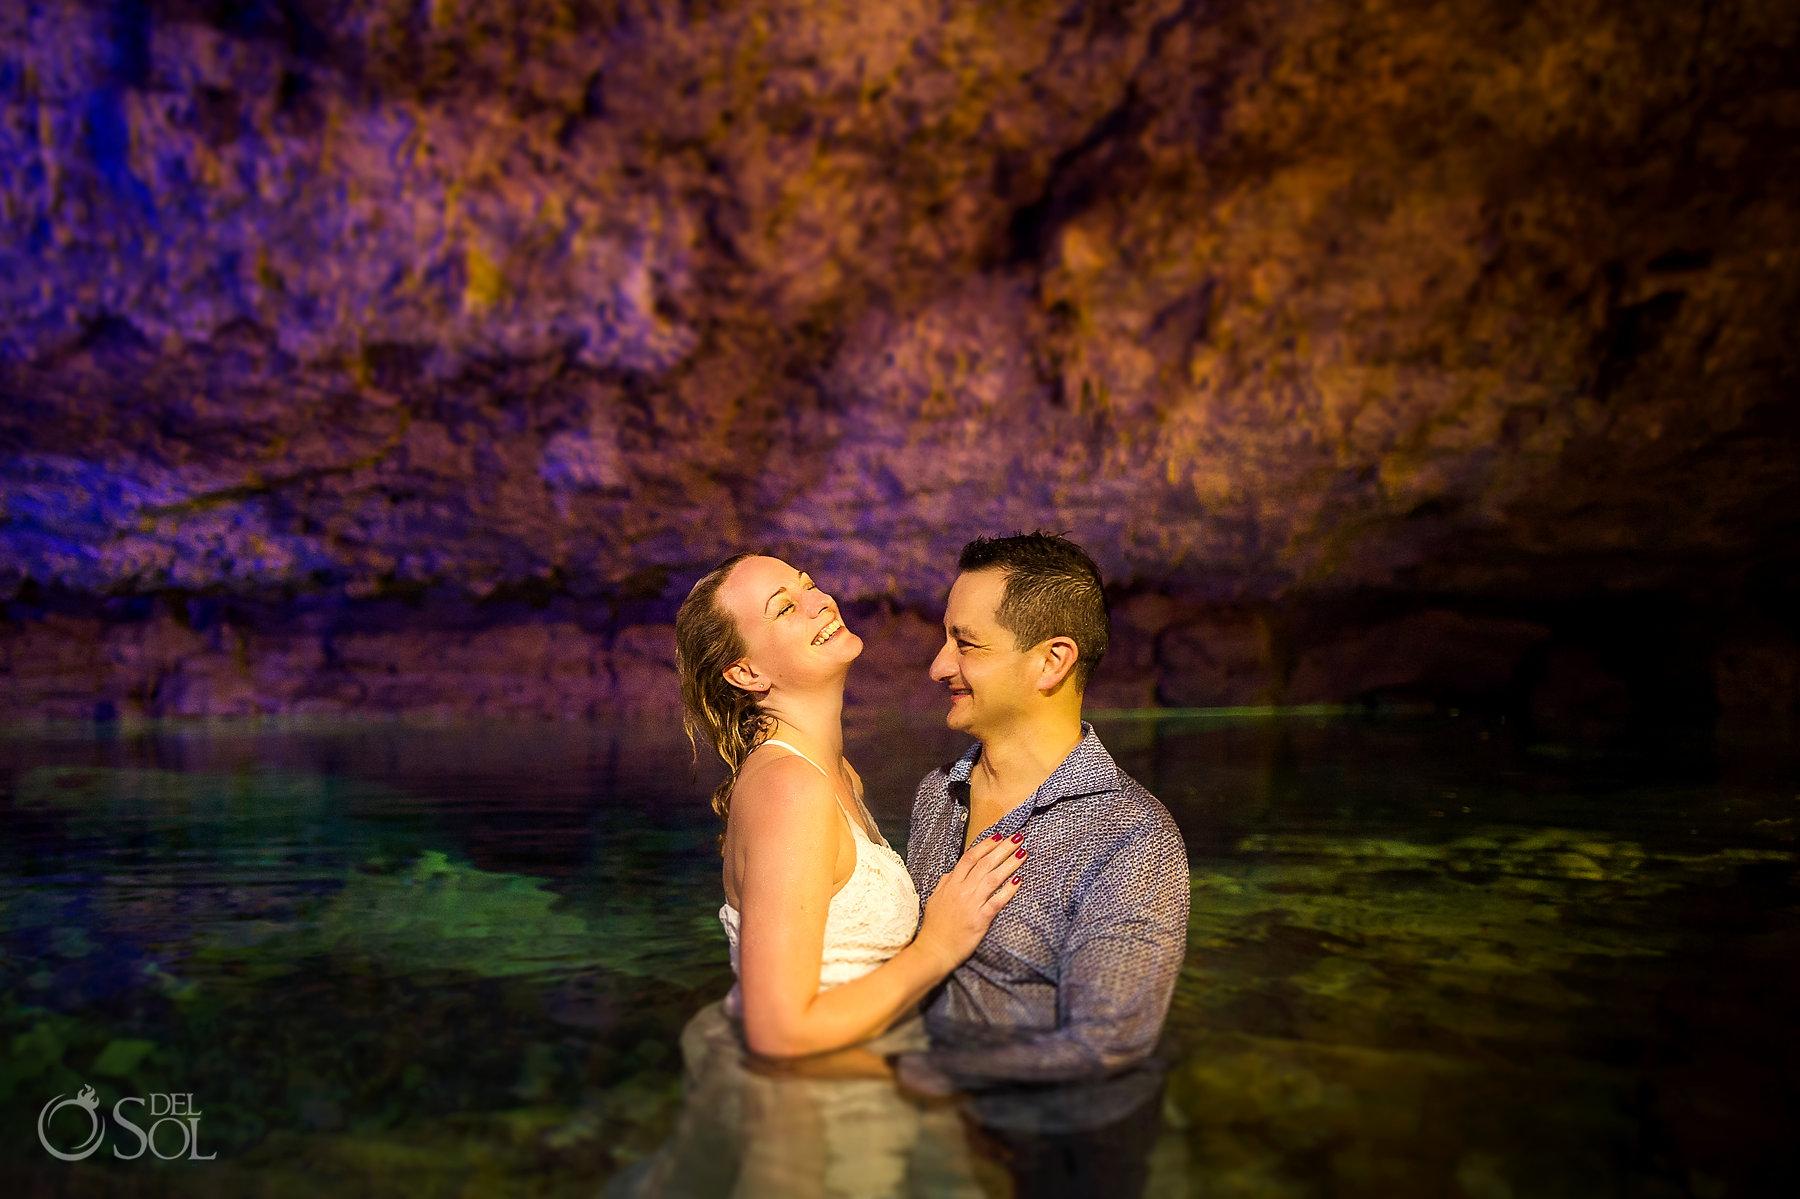 underground cave birthday Experience